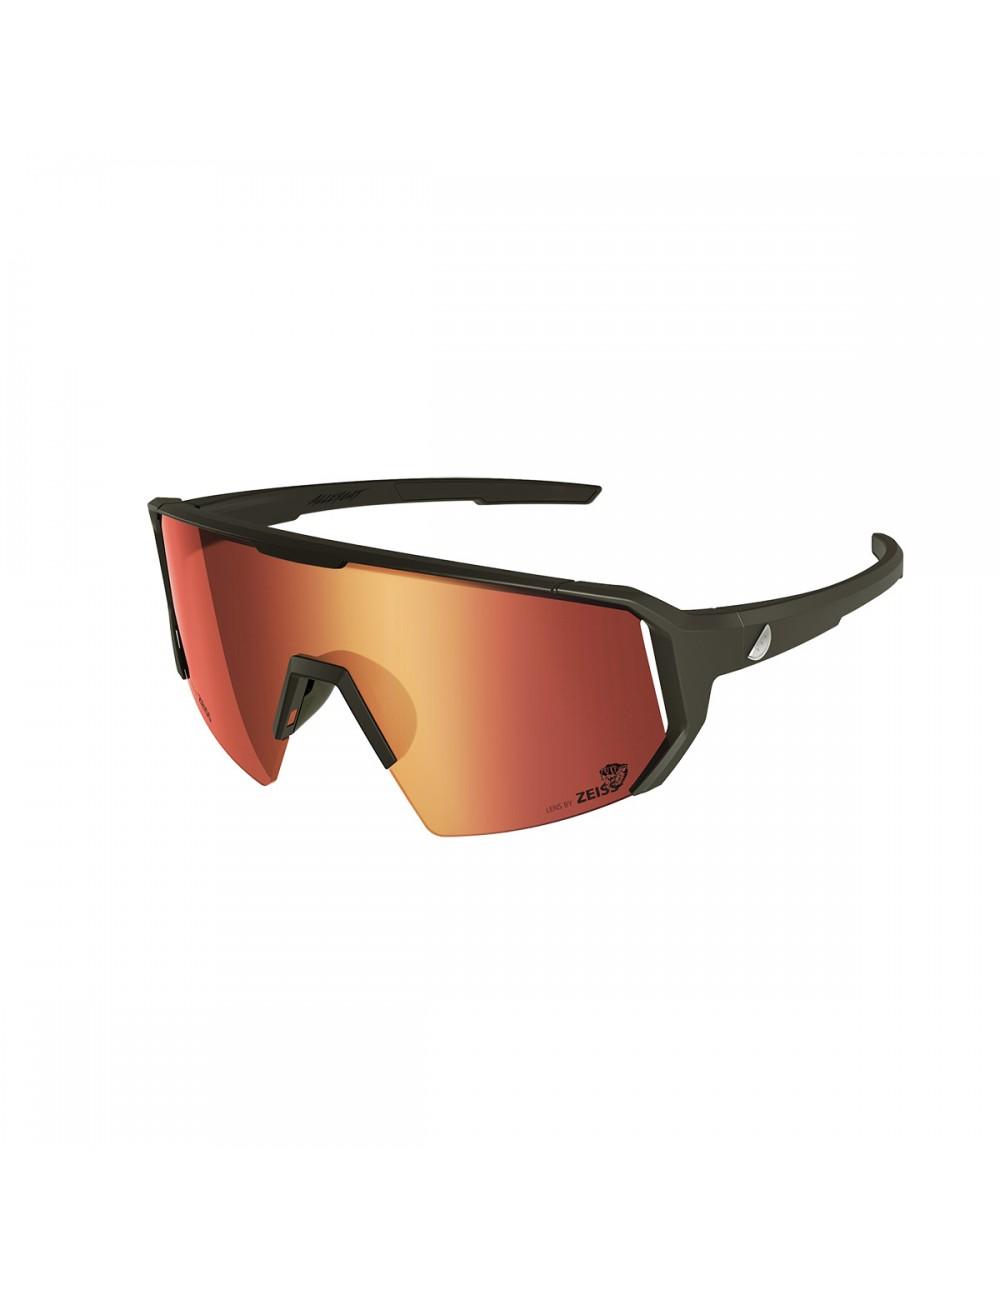 Melon Alleycat Sunglasses - Black/Red_12961